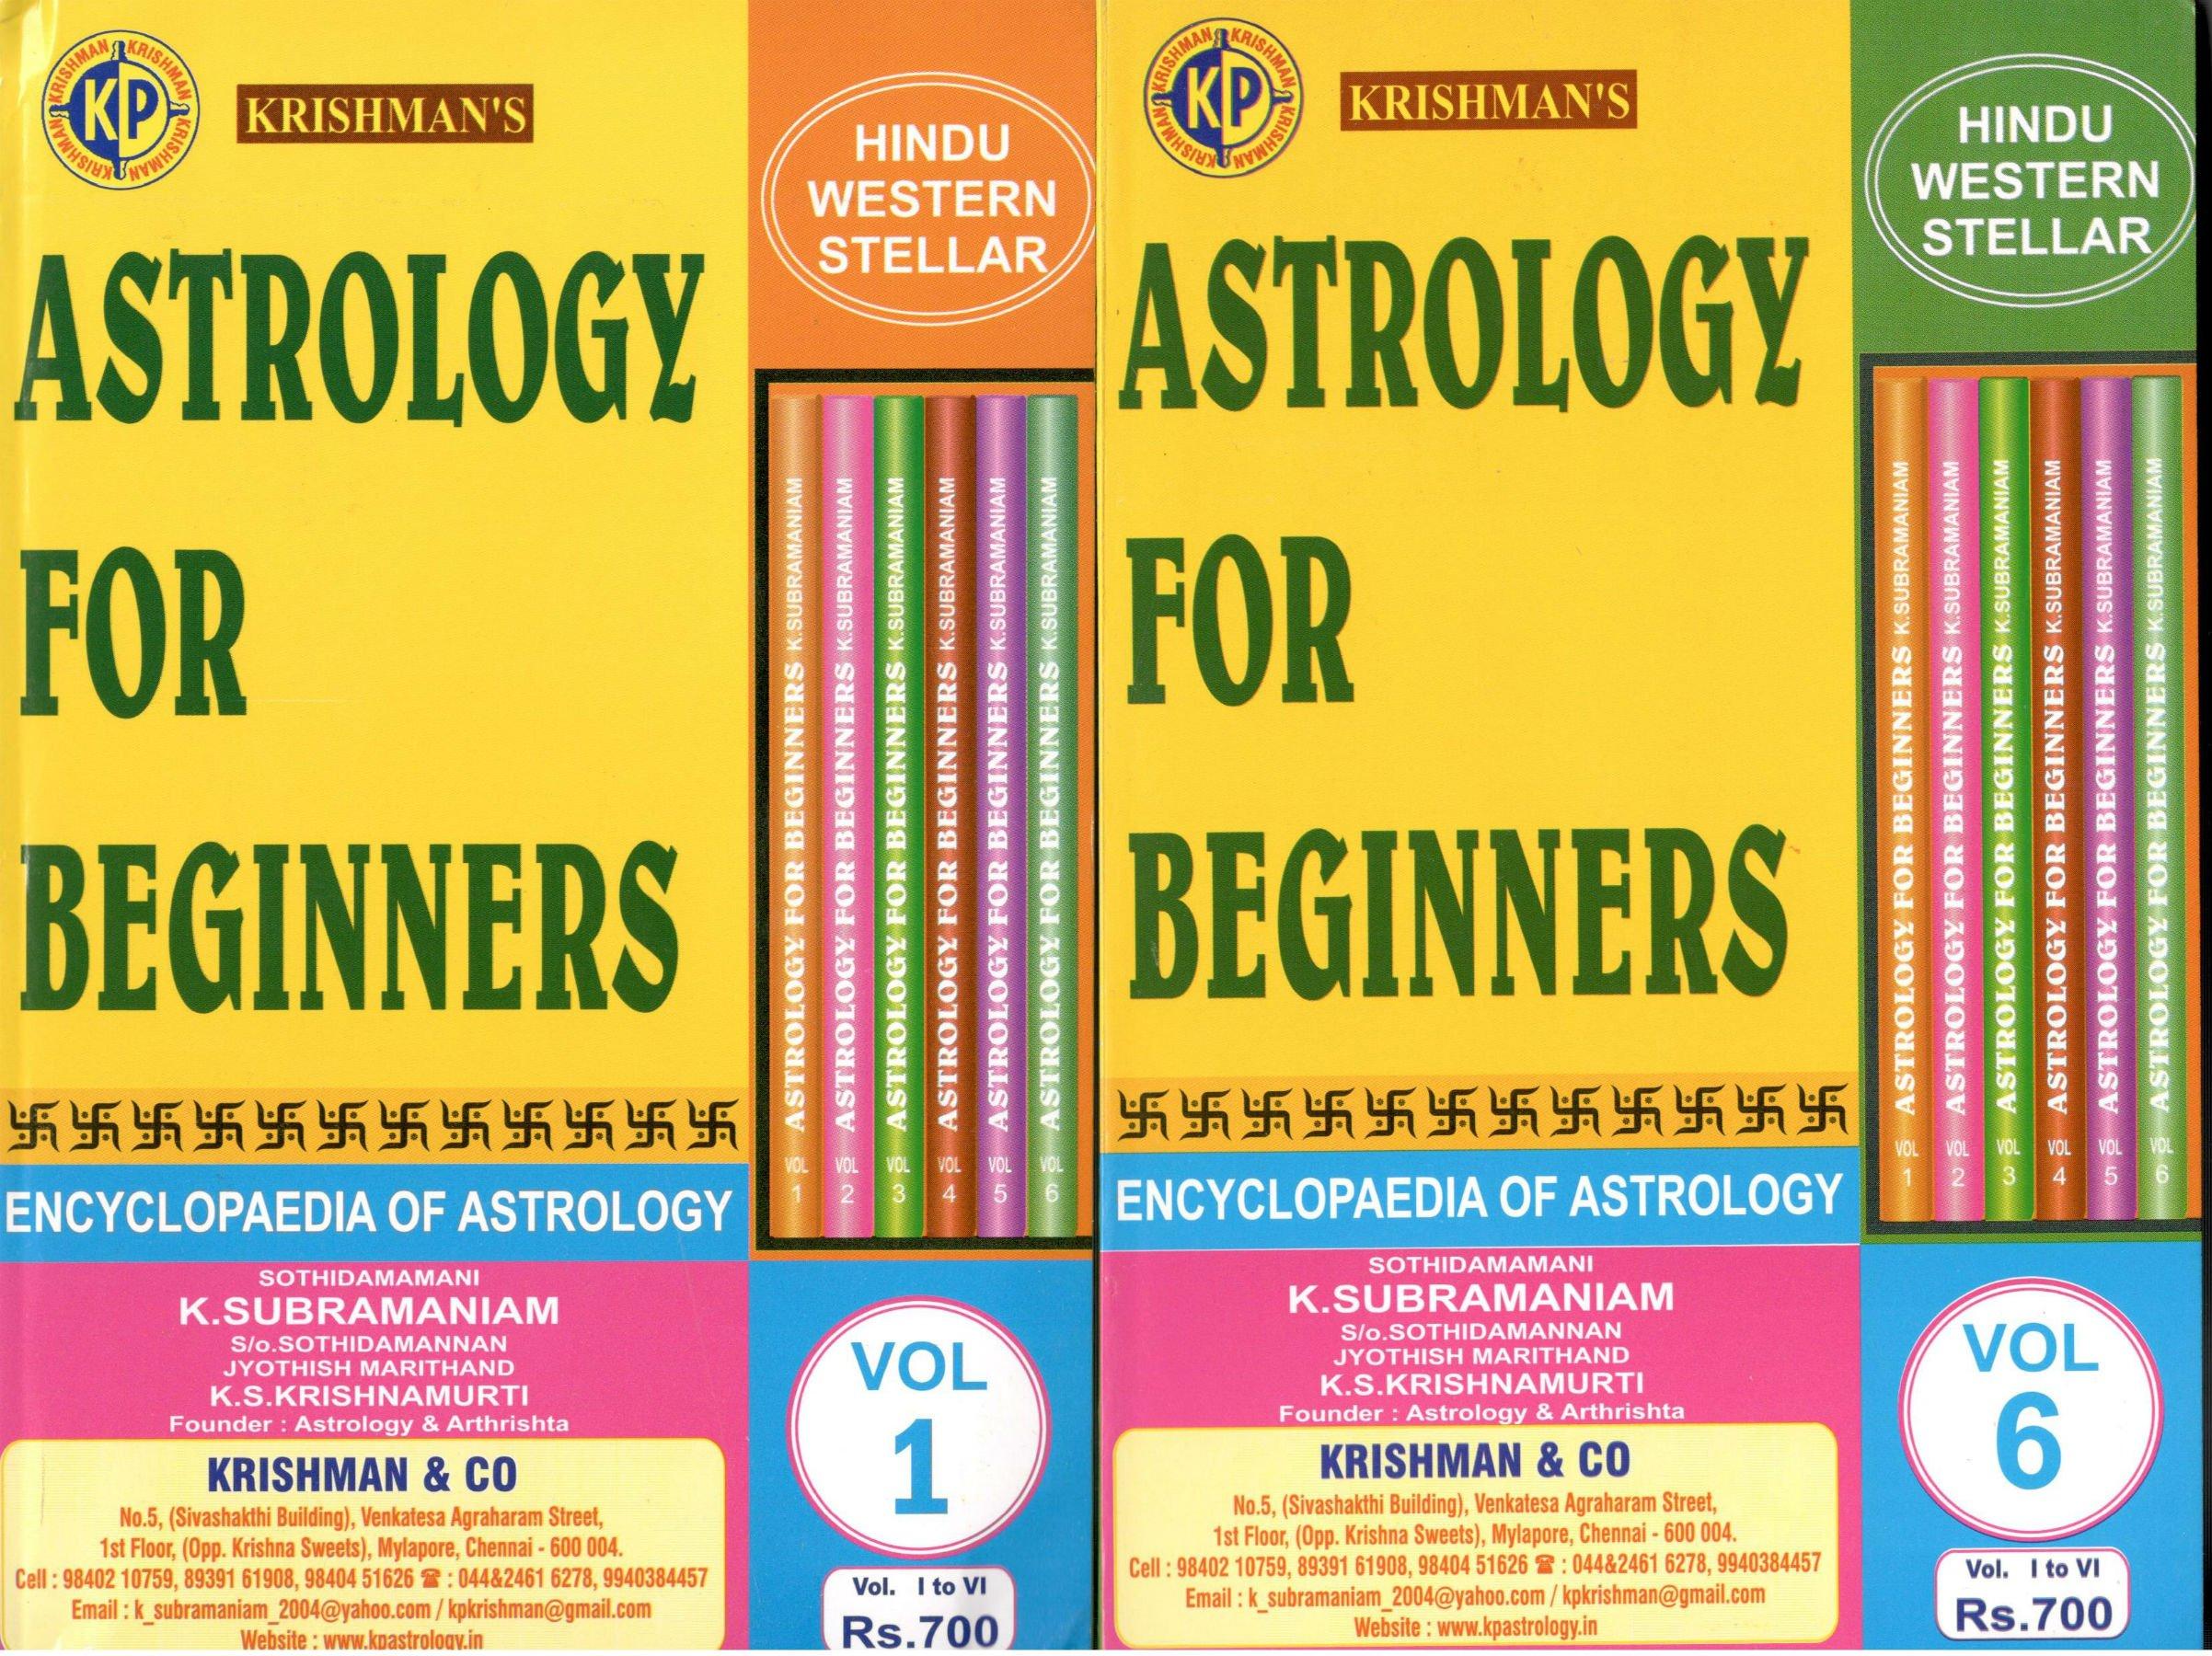 Buy Astrology for Beginners (KP - 6 Volume Set) Book Online at Low